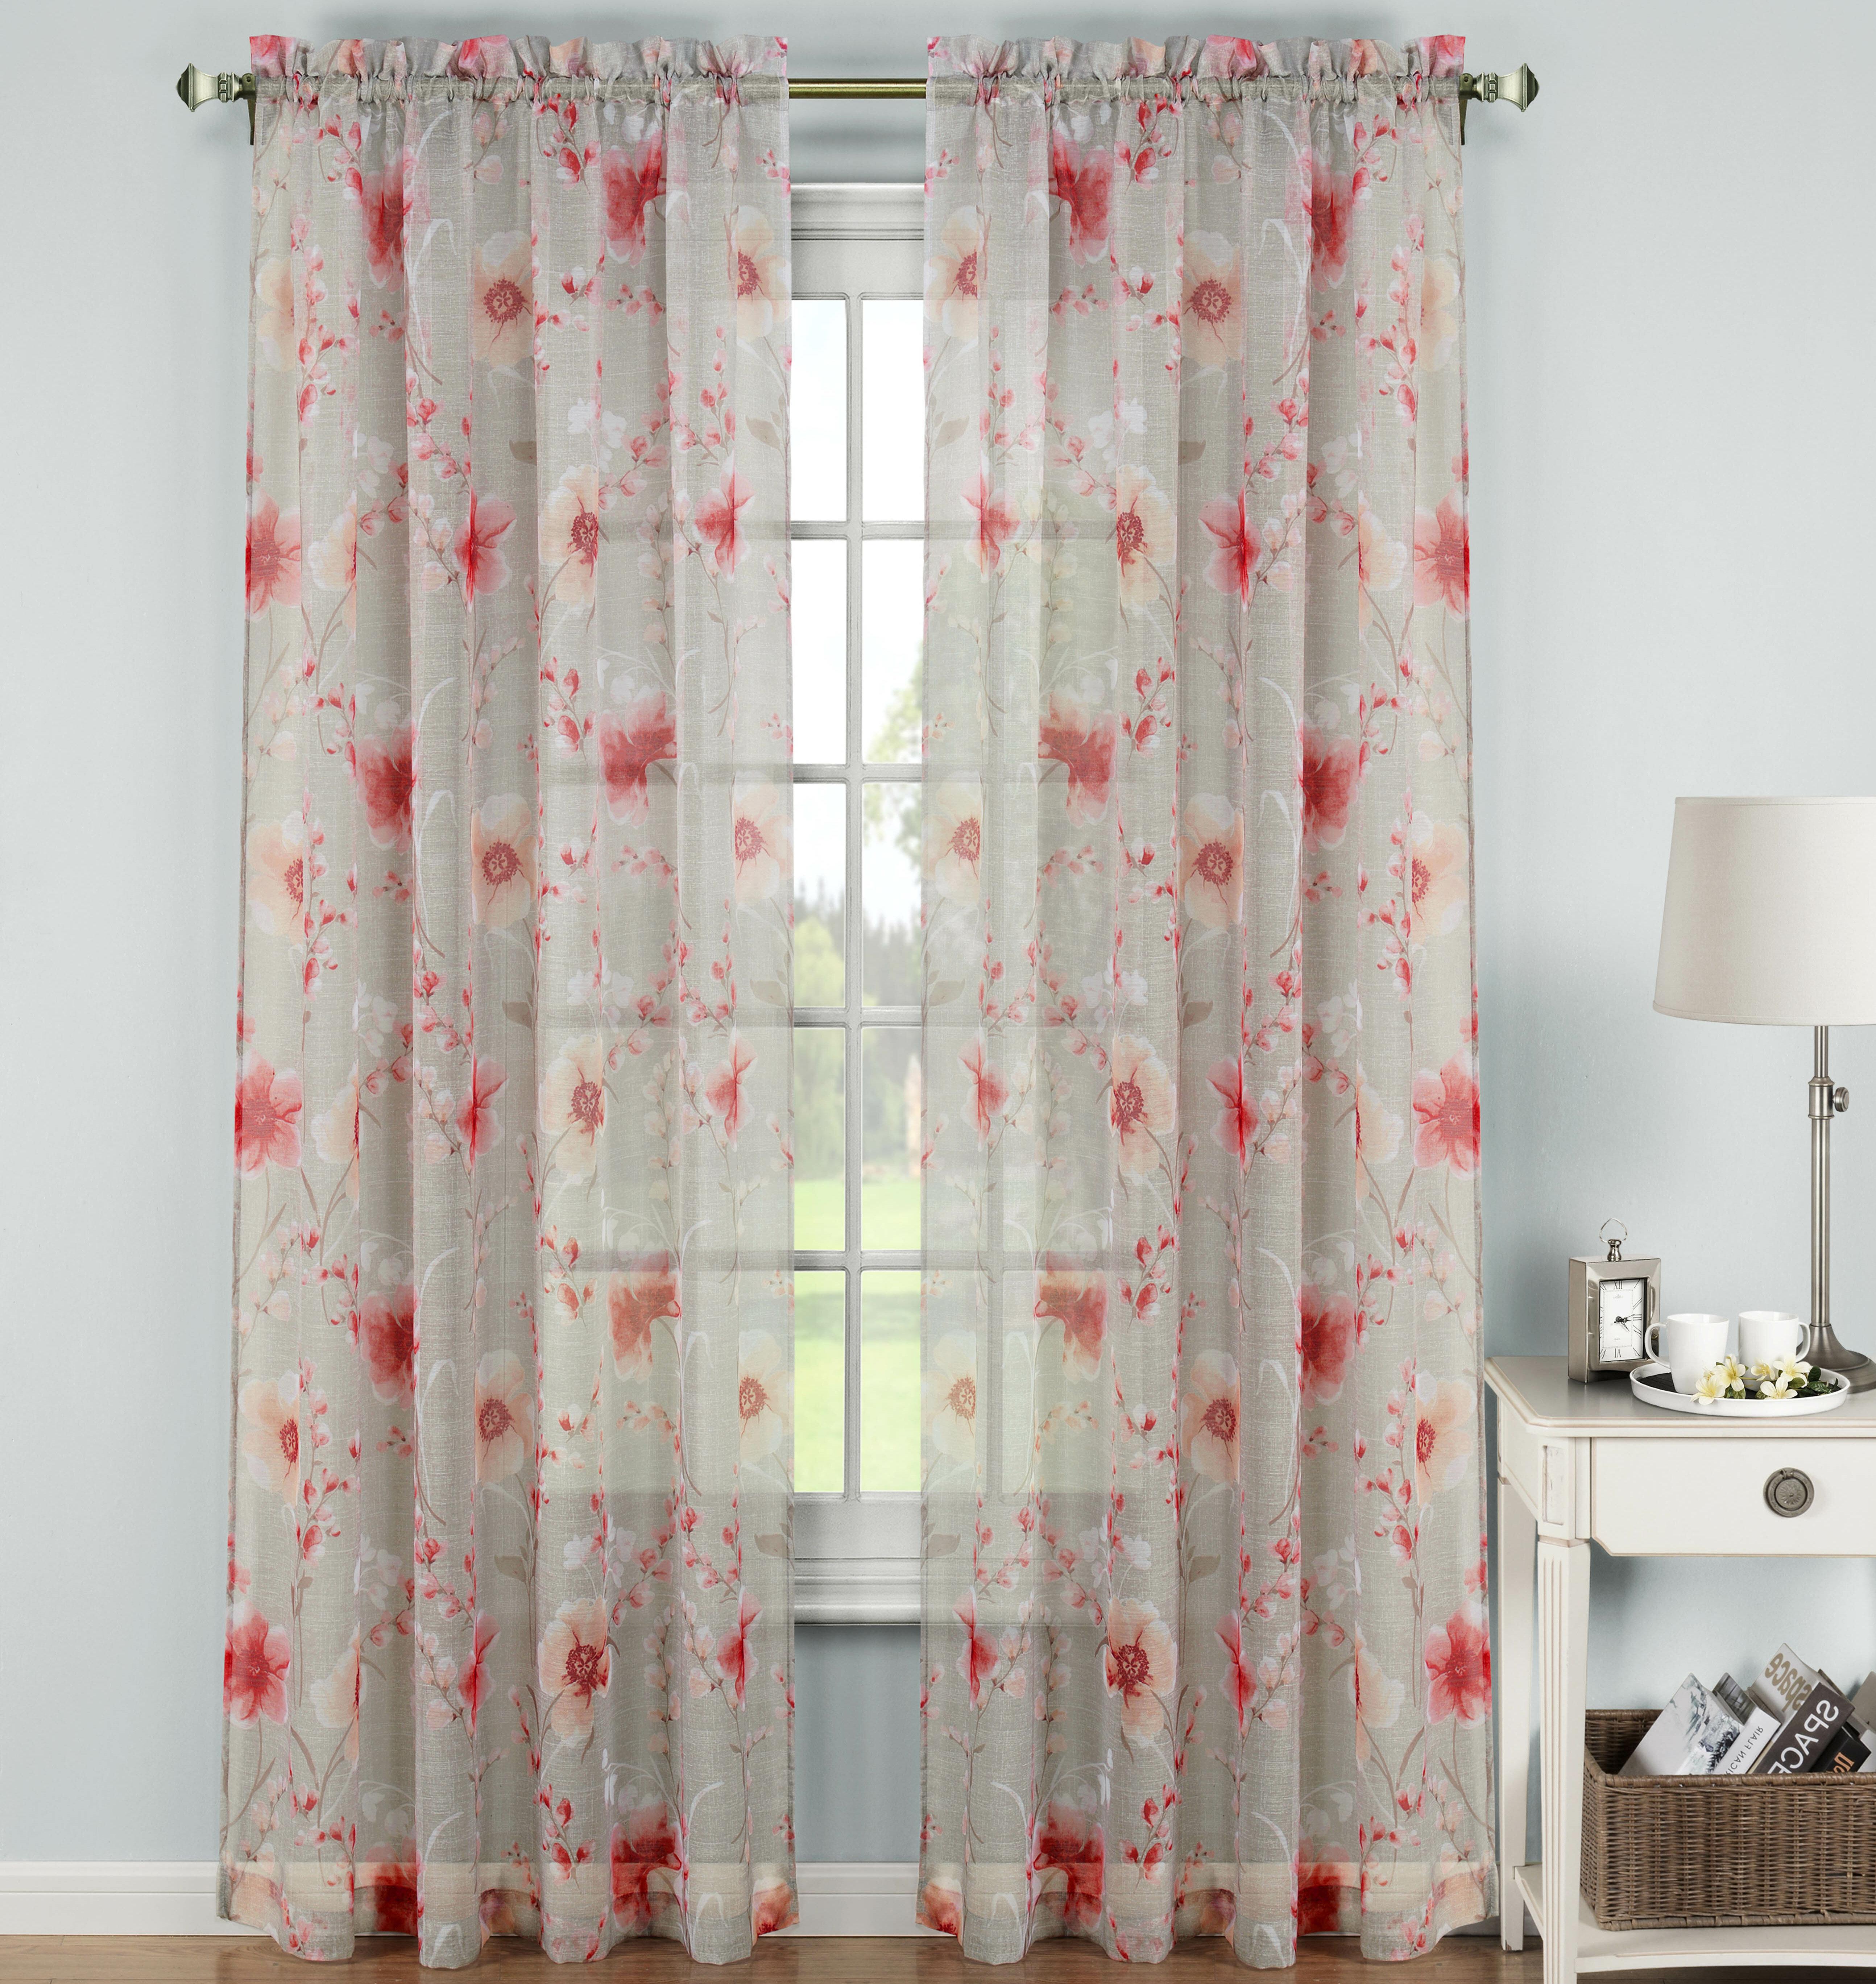 main curtains thermal loader room rod floral curtain reviews treatments nature pocket panels joss naturefloral darkening pdp window